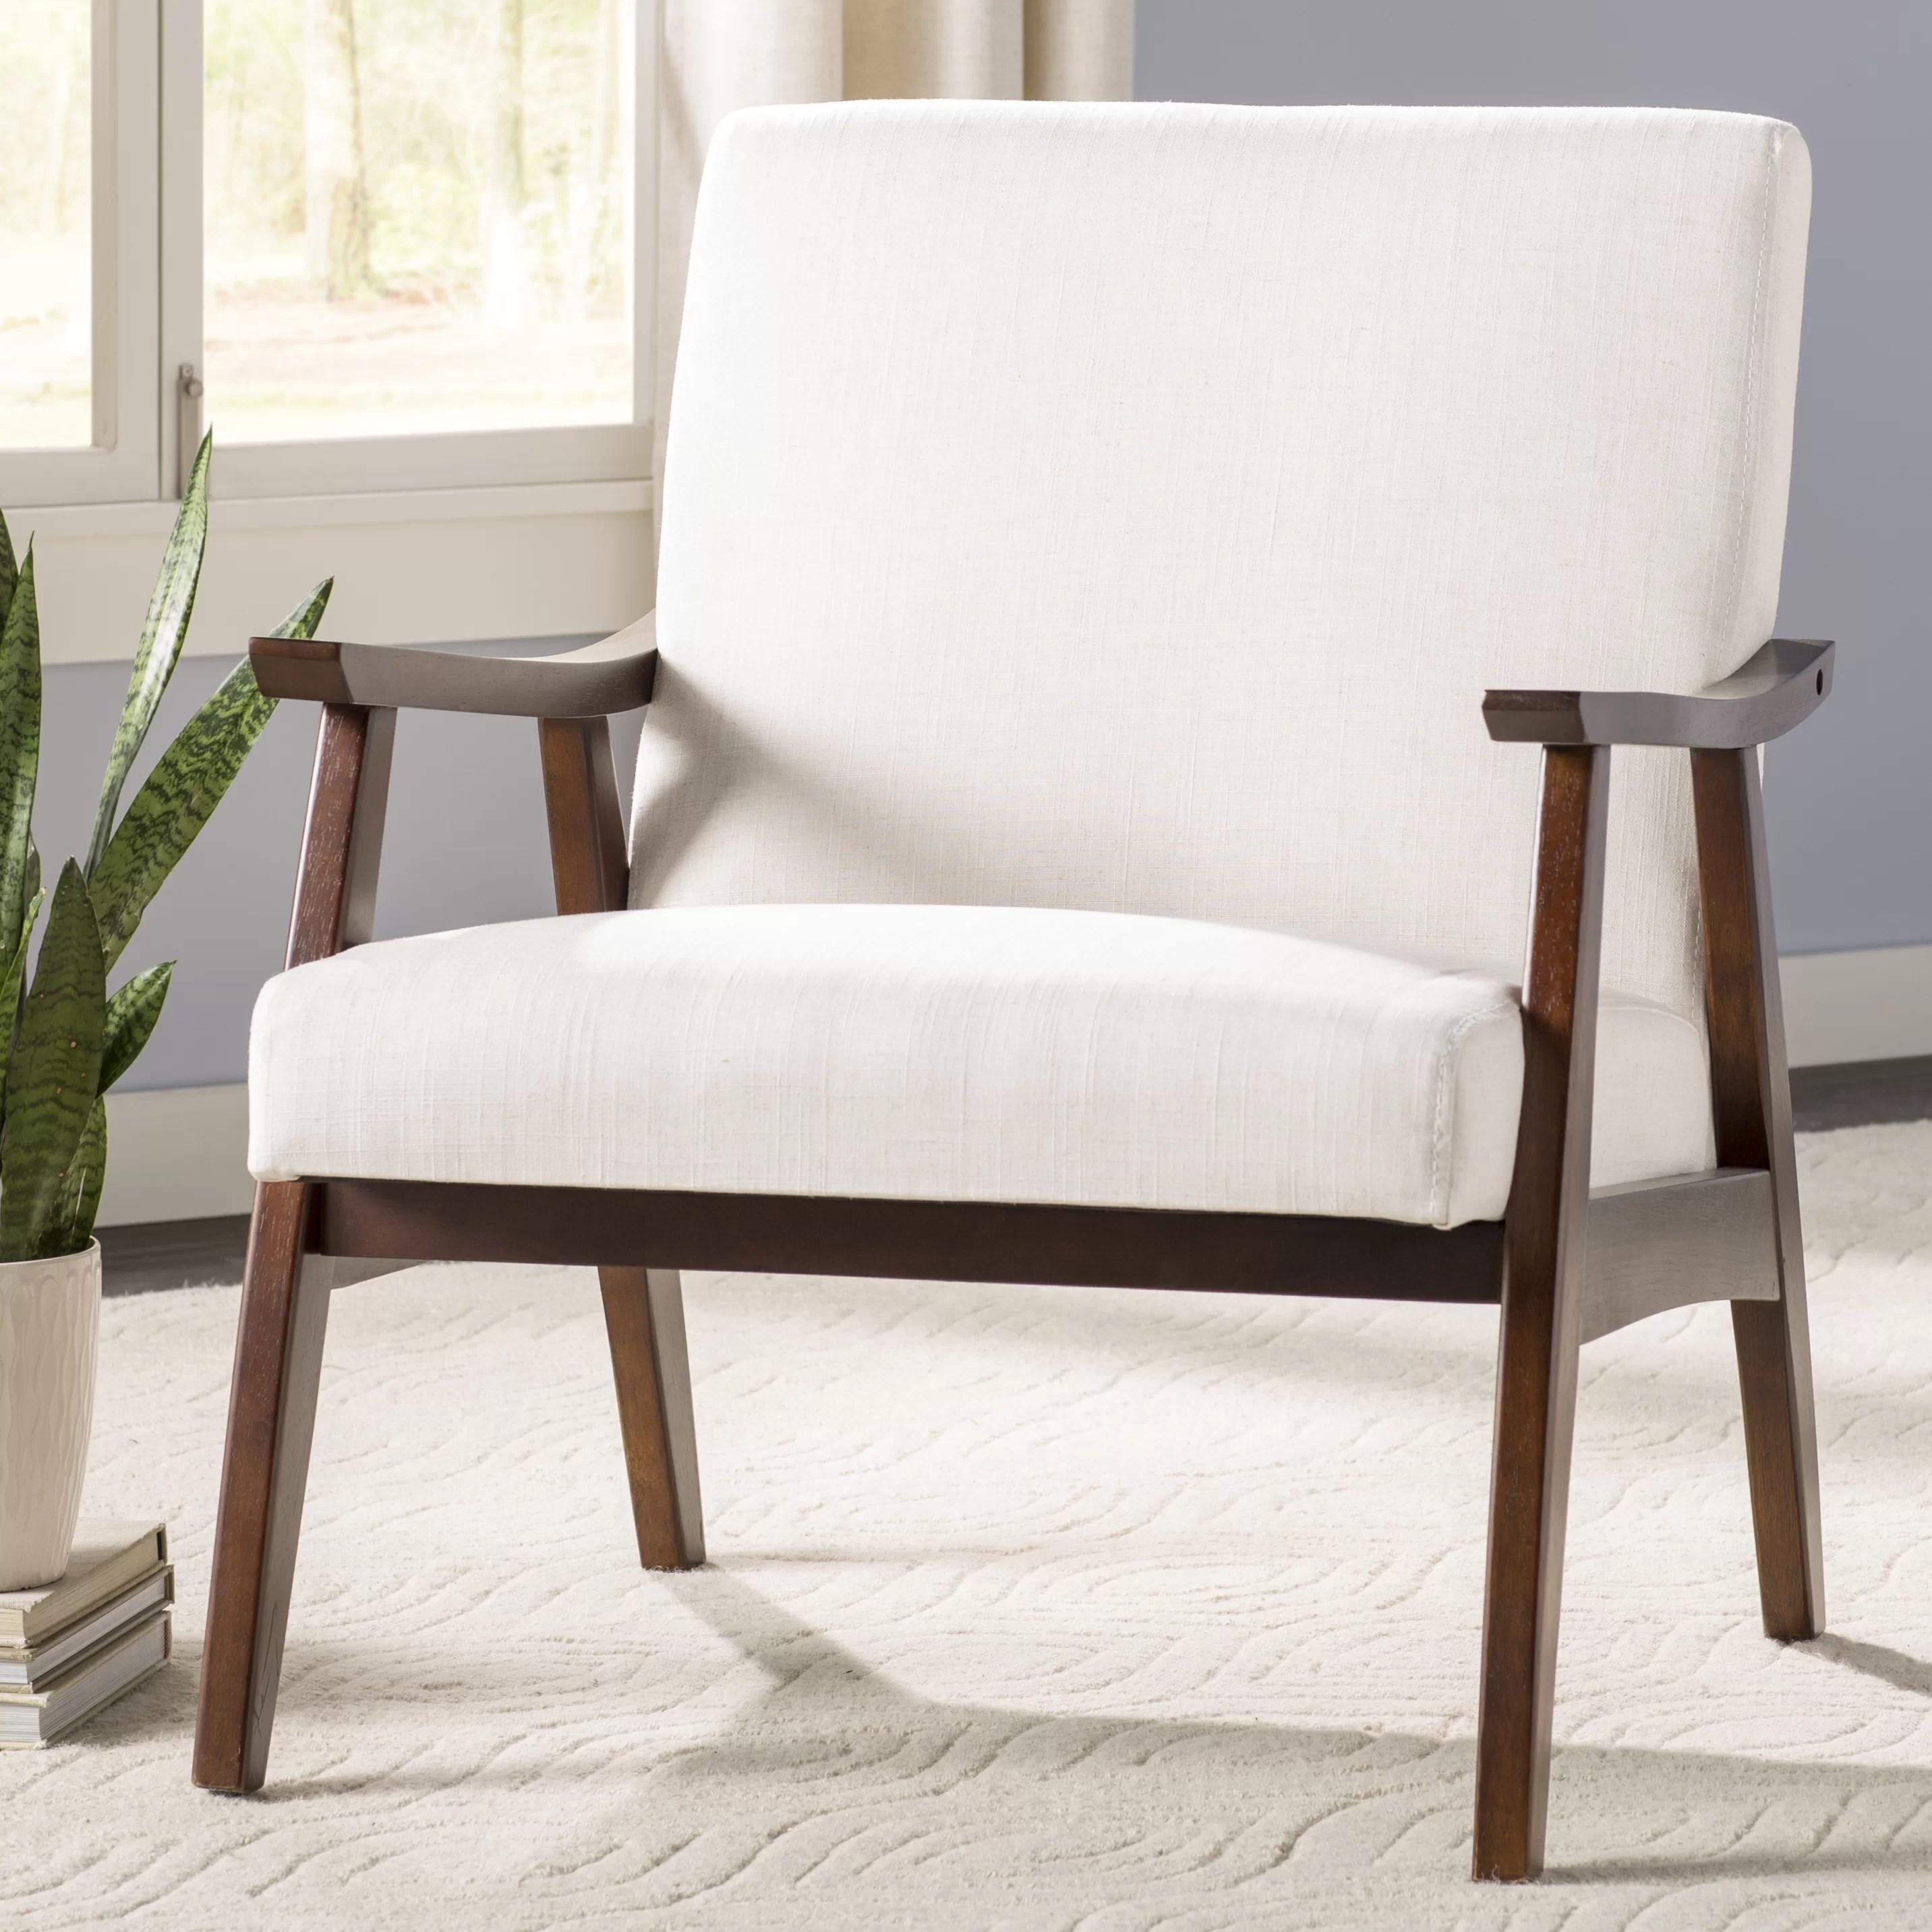 2 x 4 deck chair dental upholstery langley street coral springs lounge reviews wayfair